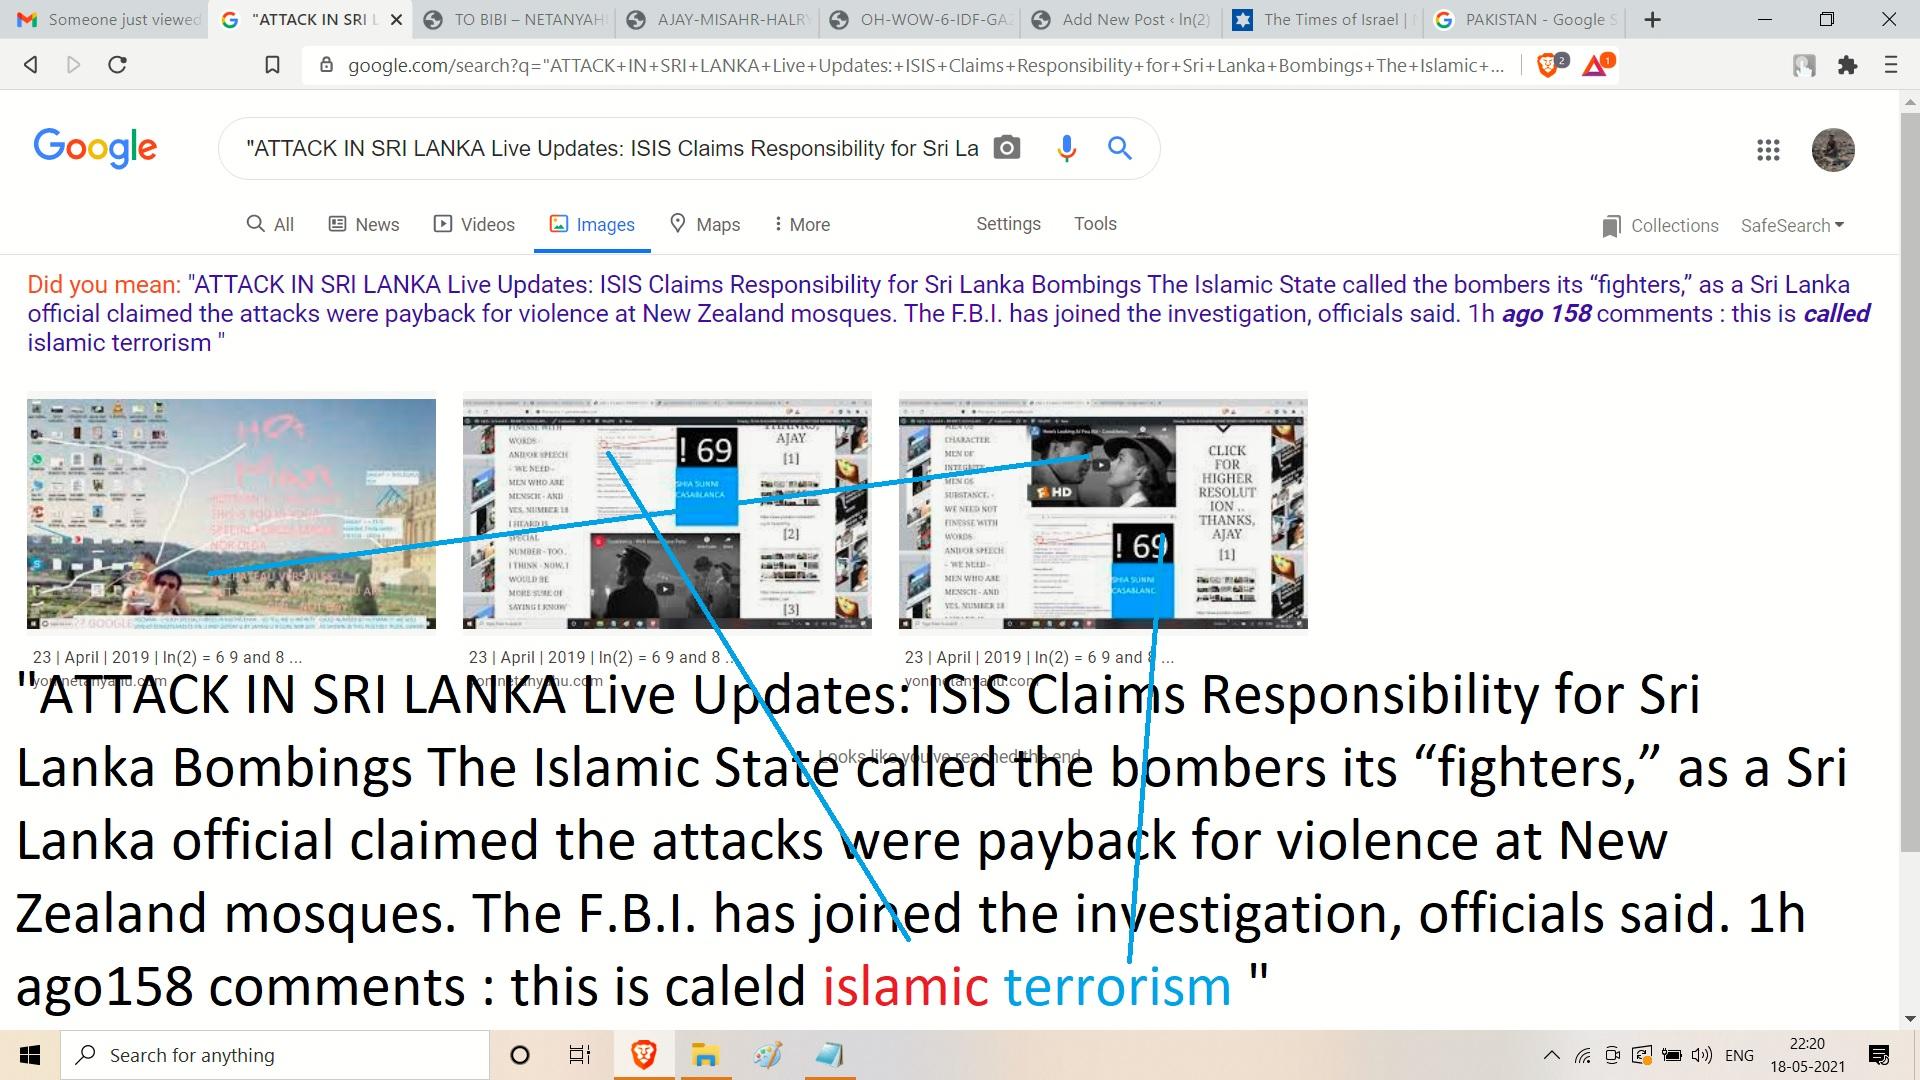 ISALMCI TERROSIM - REGASD CASABLANCA 6